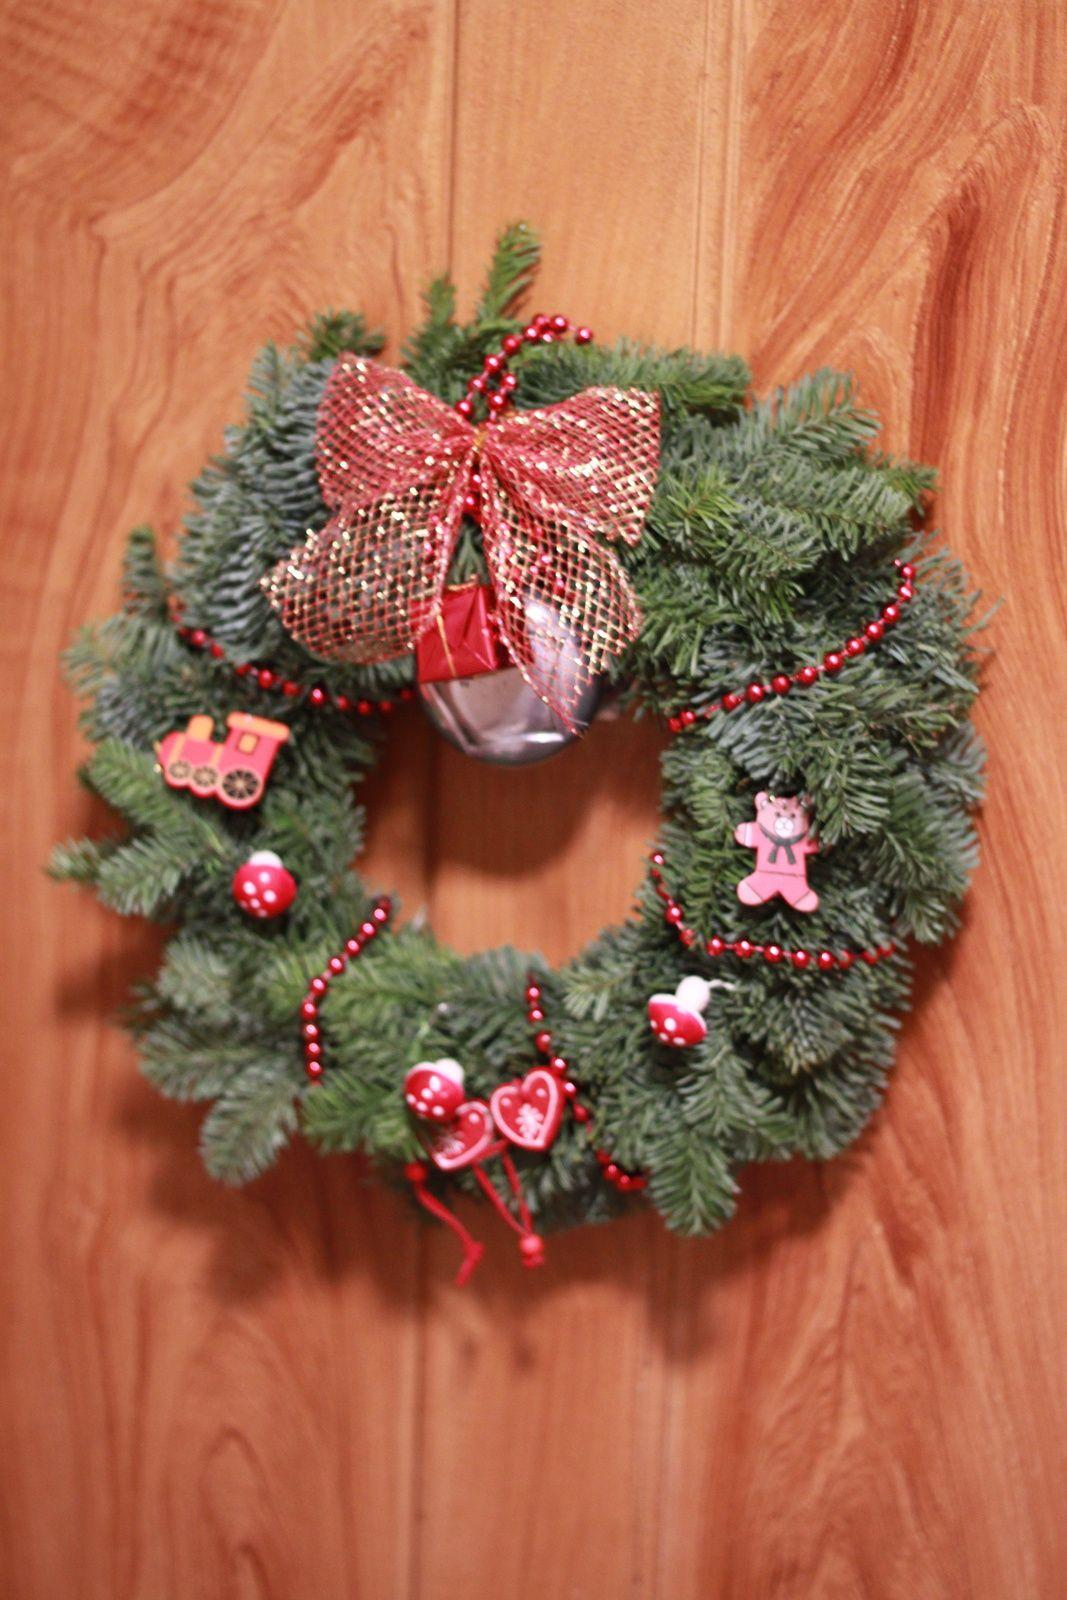 Noël de la porte au salon...!